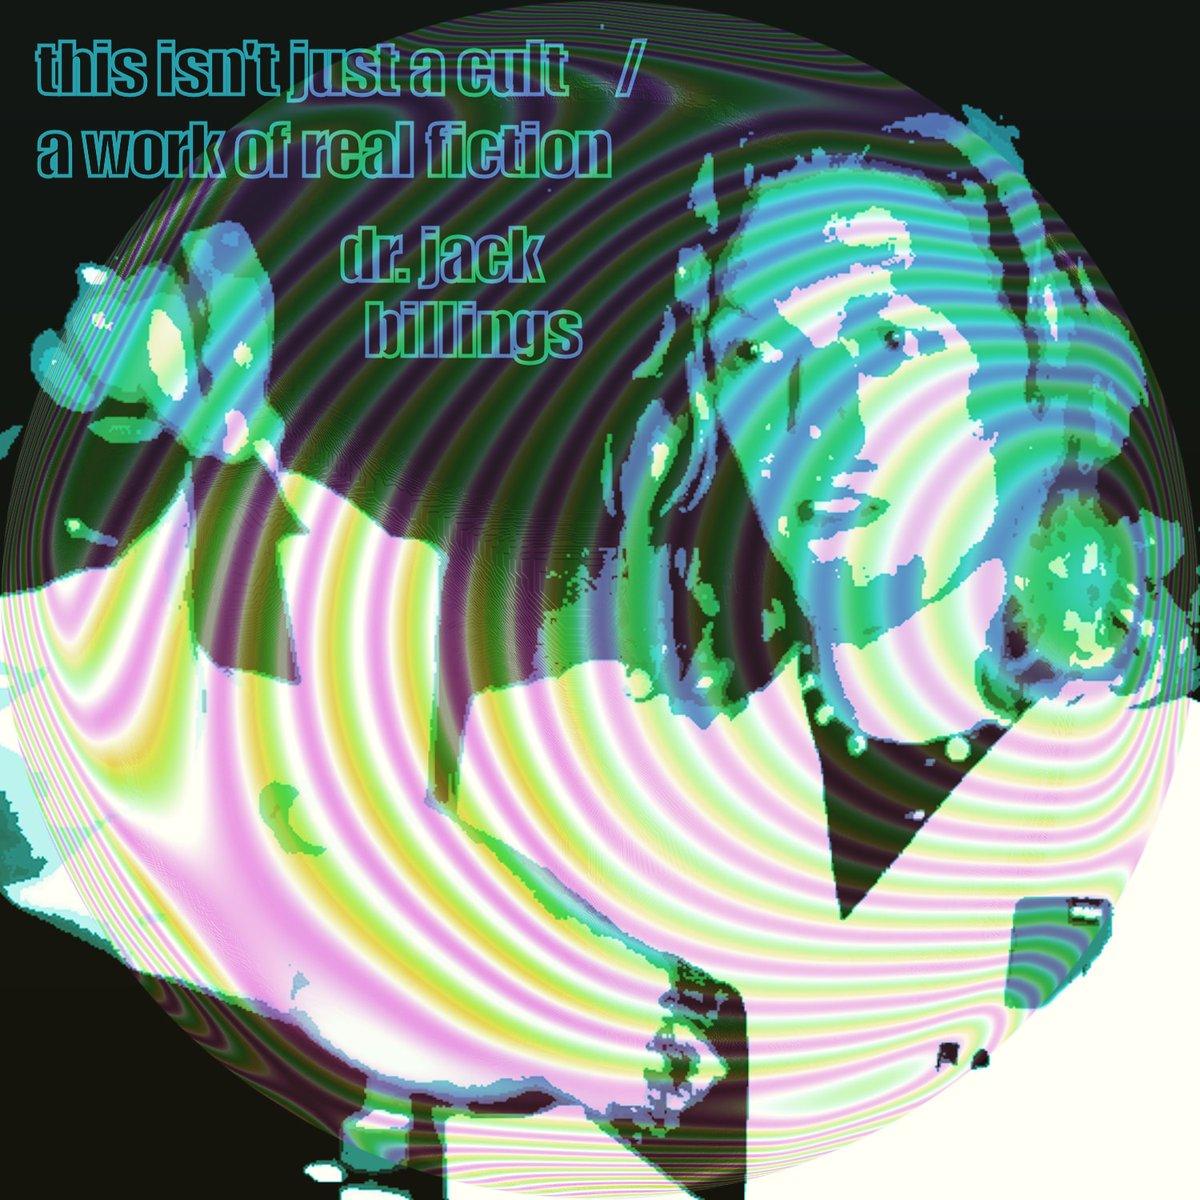 New podcast episode!!! Björ6n Oranj revisits his appearances as Dr. Jack Billings.  CLICK ON THE WEBSITE IN THE PROFILE to listen.  #podcast #writing #newepisode #podcasting #comedy #jackbillings #pharmacist #drugdealer #comedypodcast #dr #doctor #absurdism #artcollective #cultpic.twitter.com/svQSCopIvR